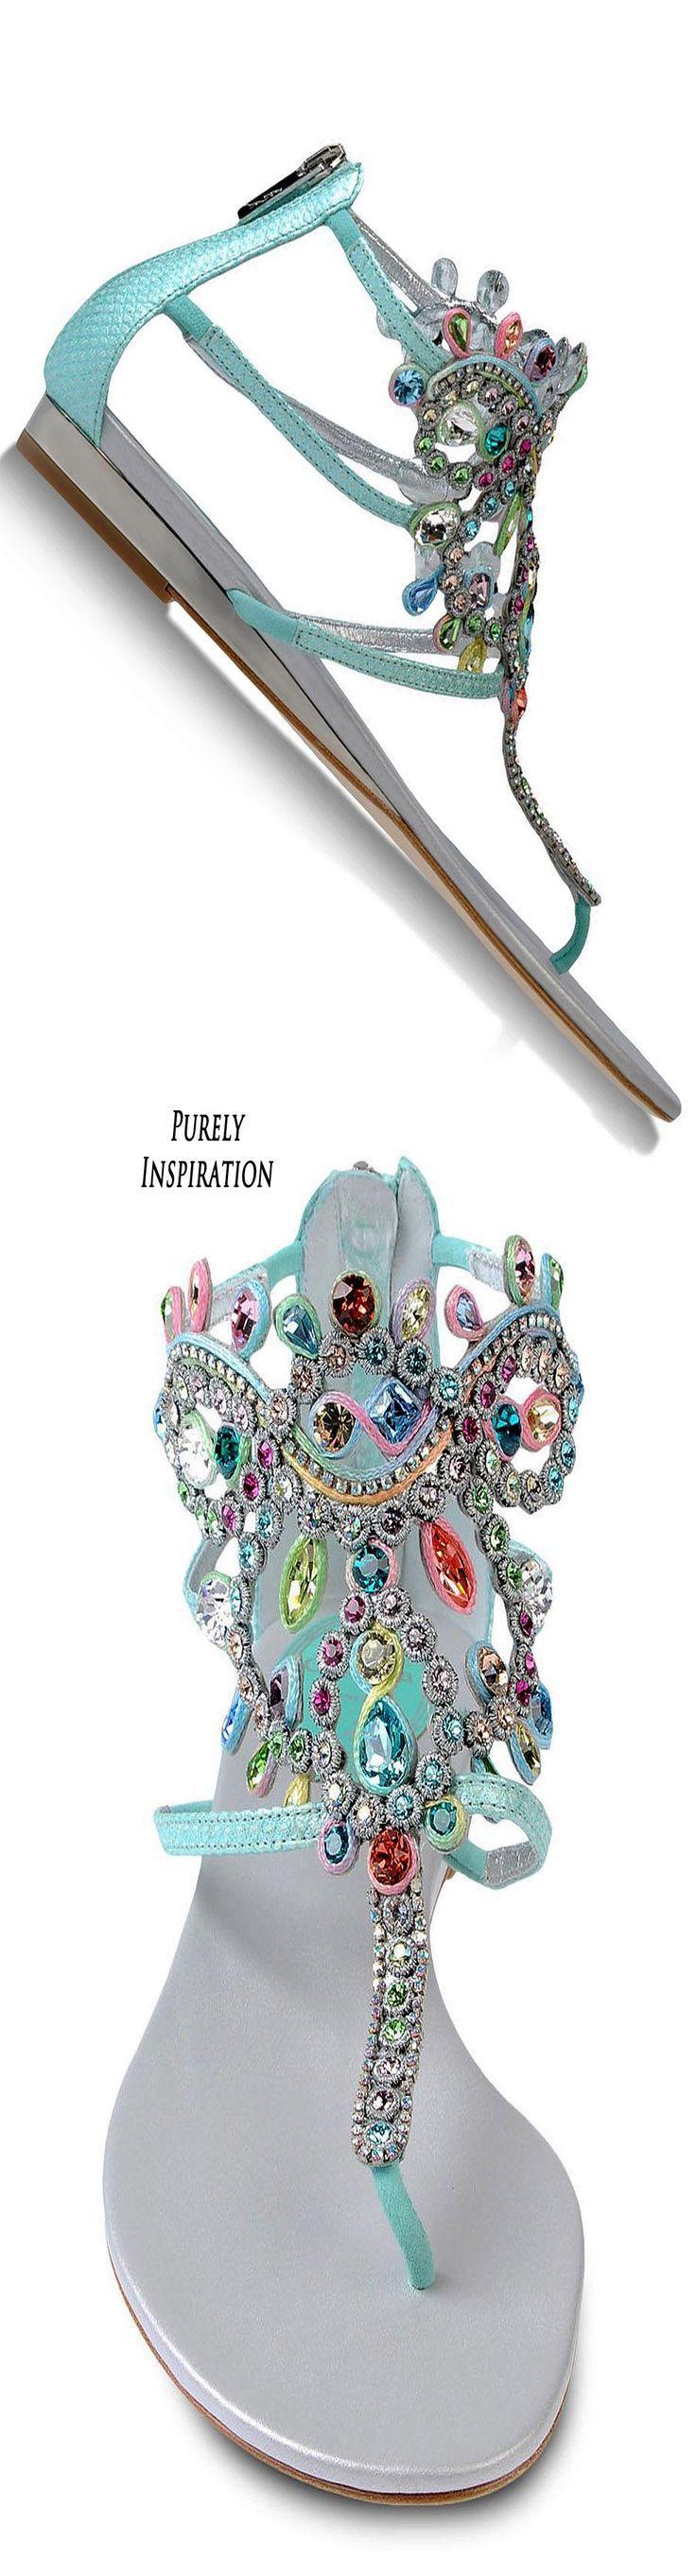 Tendance & idée Chaussures Femme 2016/2017 Description Rene' Caovilla ~ Jewel Embellished Summer Sandals